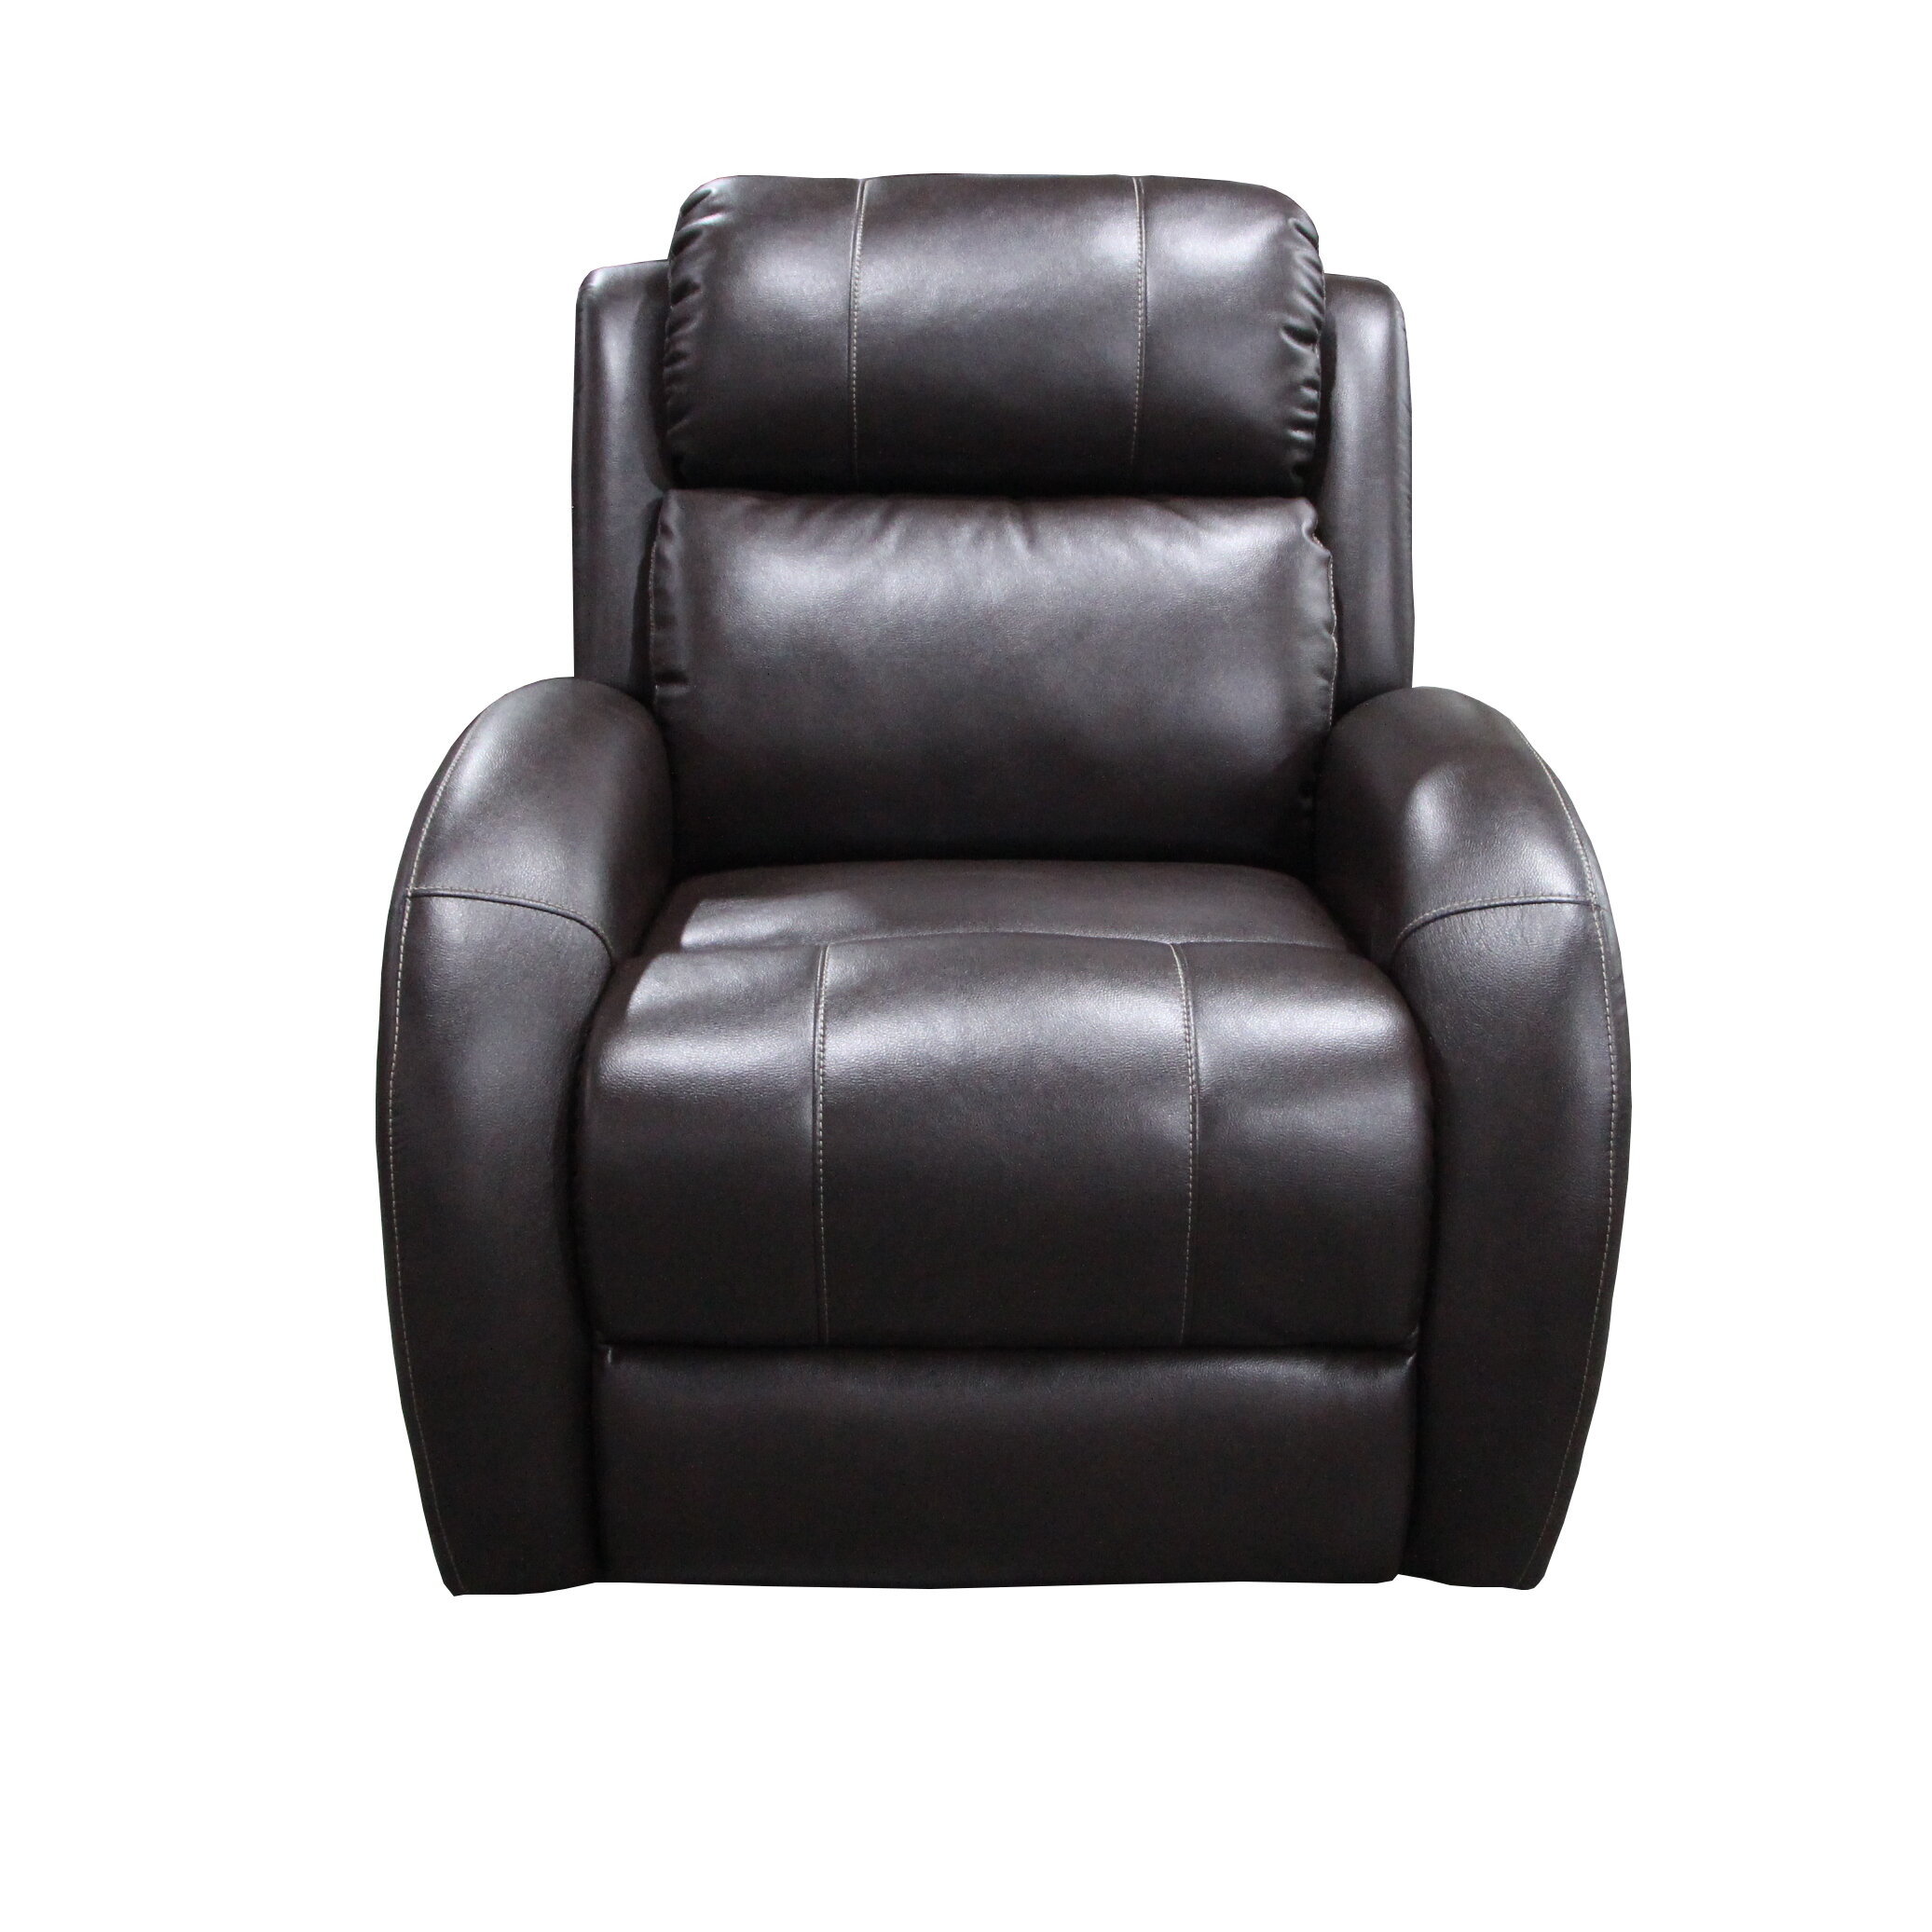 Red barrel studio kristina curve wall hugger power recliner wayfair